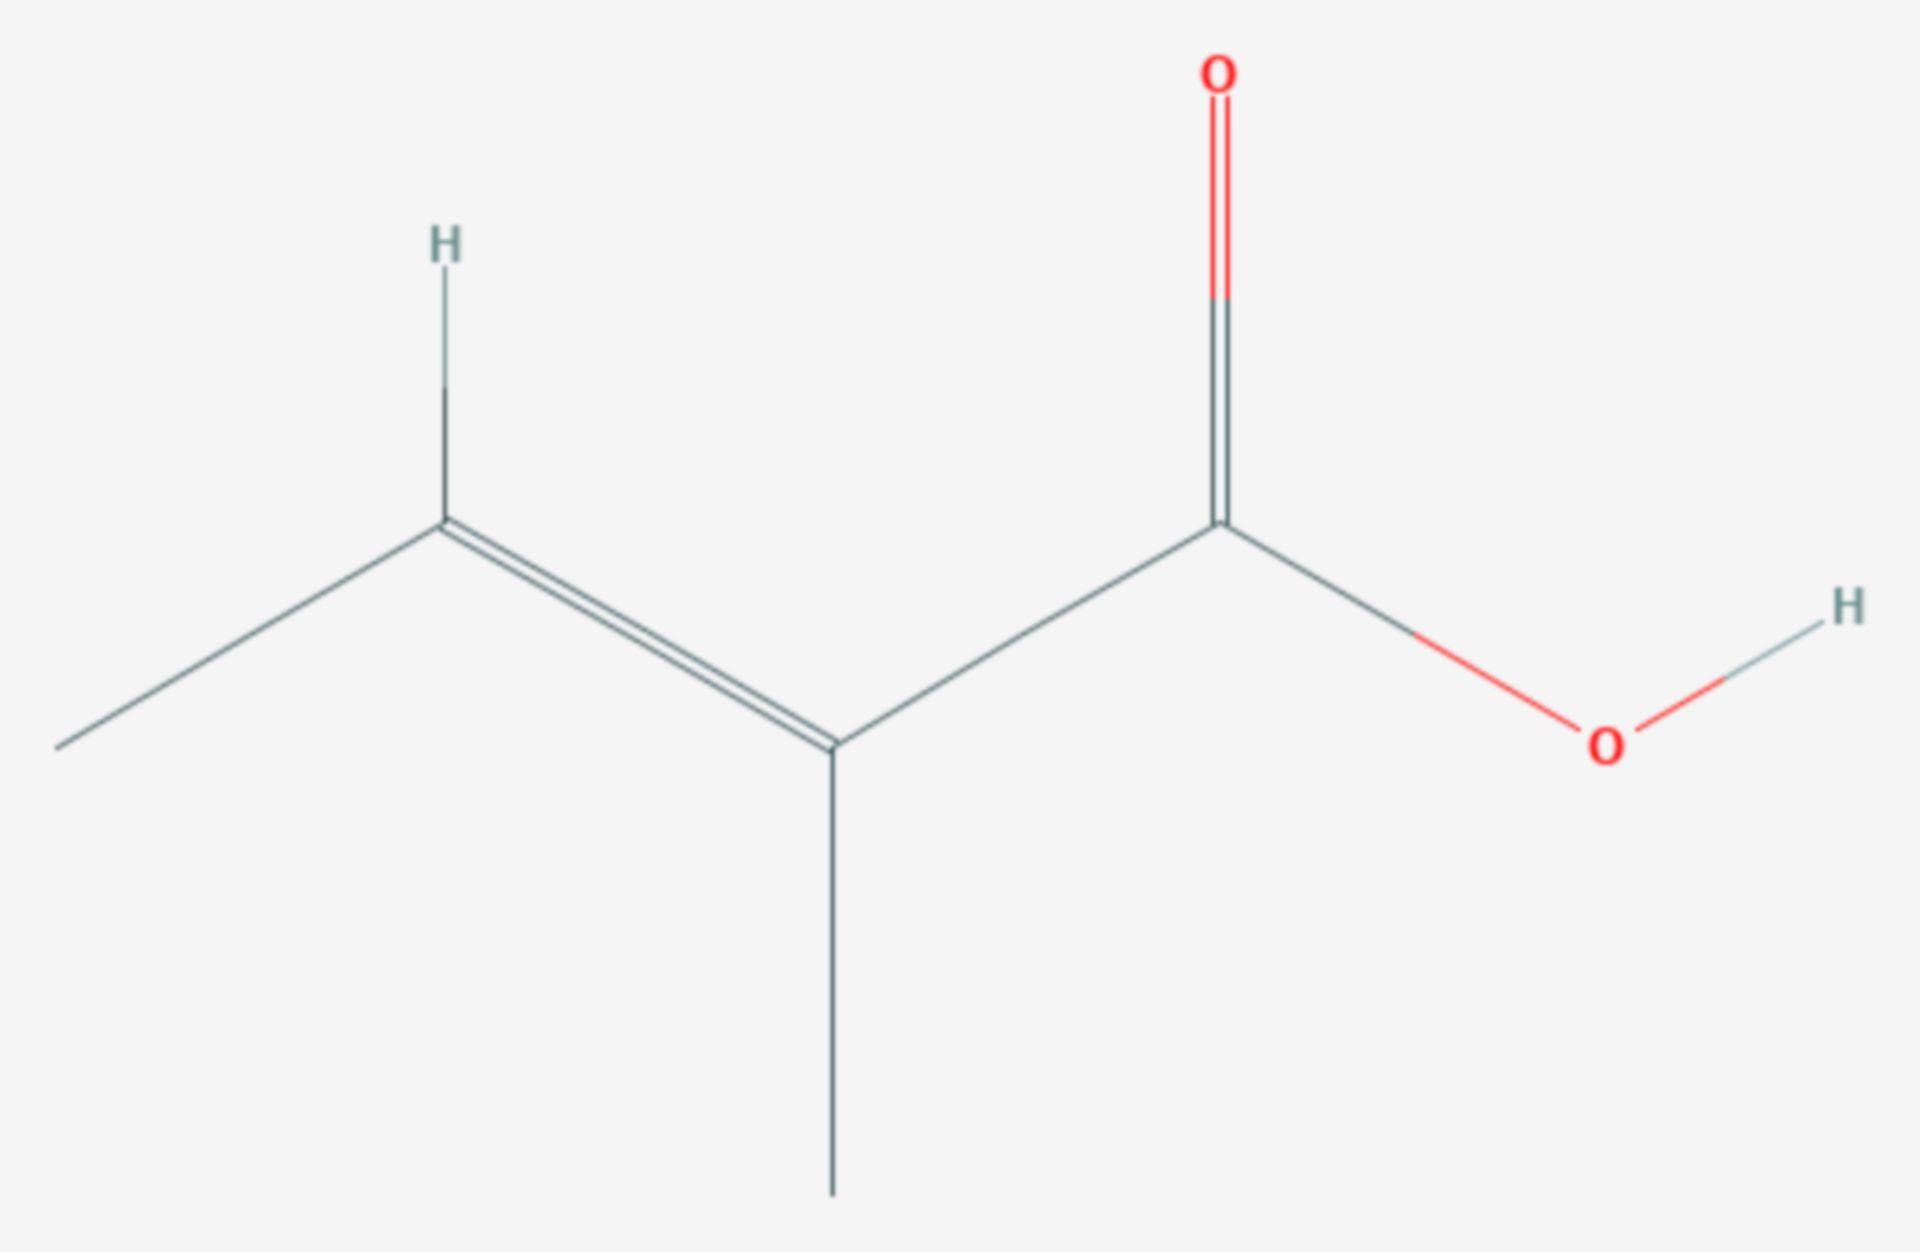 Tiglinsäure (Strukturformel)